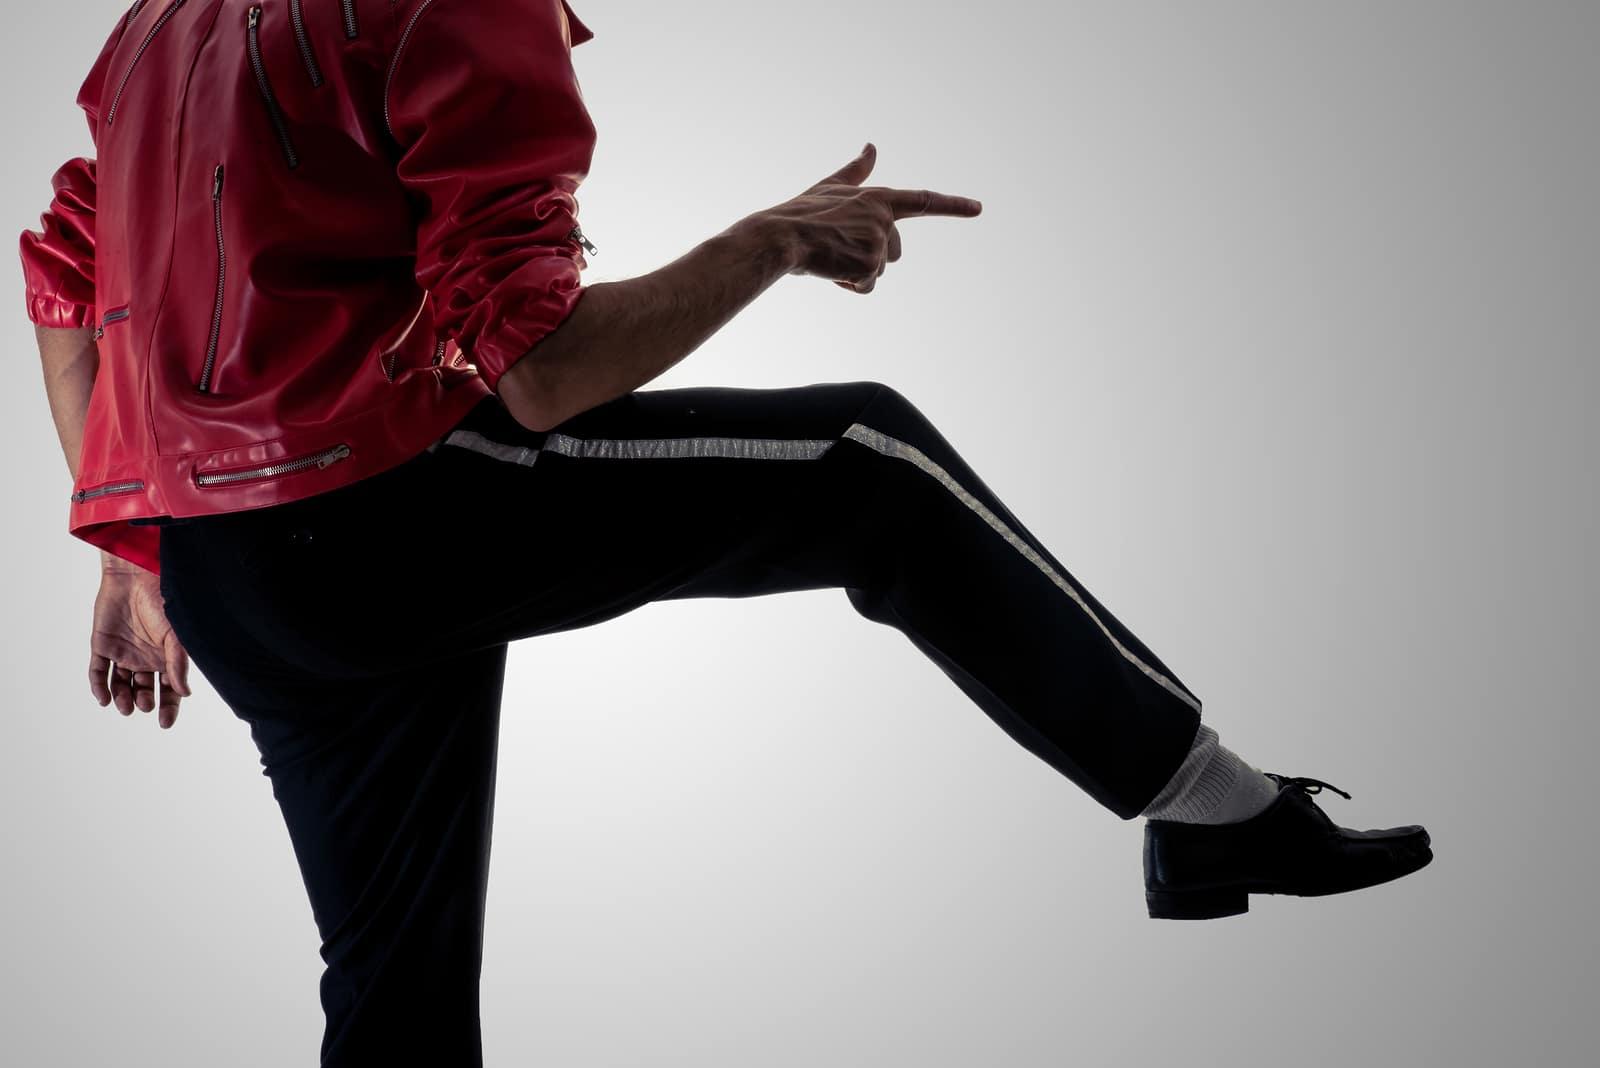 Macaulay Culkin declara: Michael Jackson abusó de mi